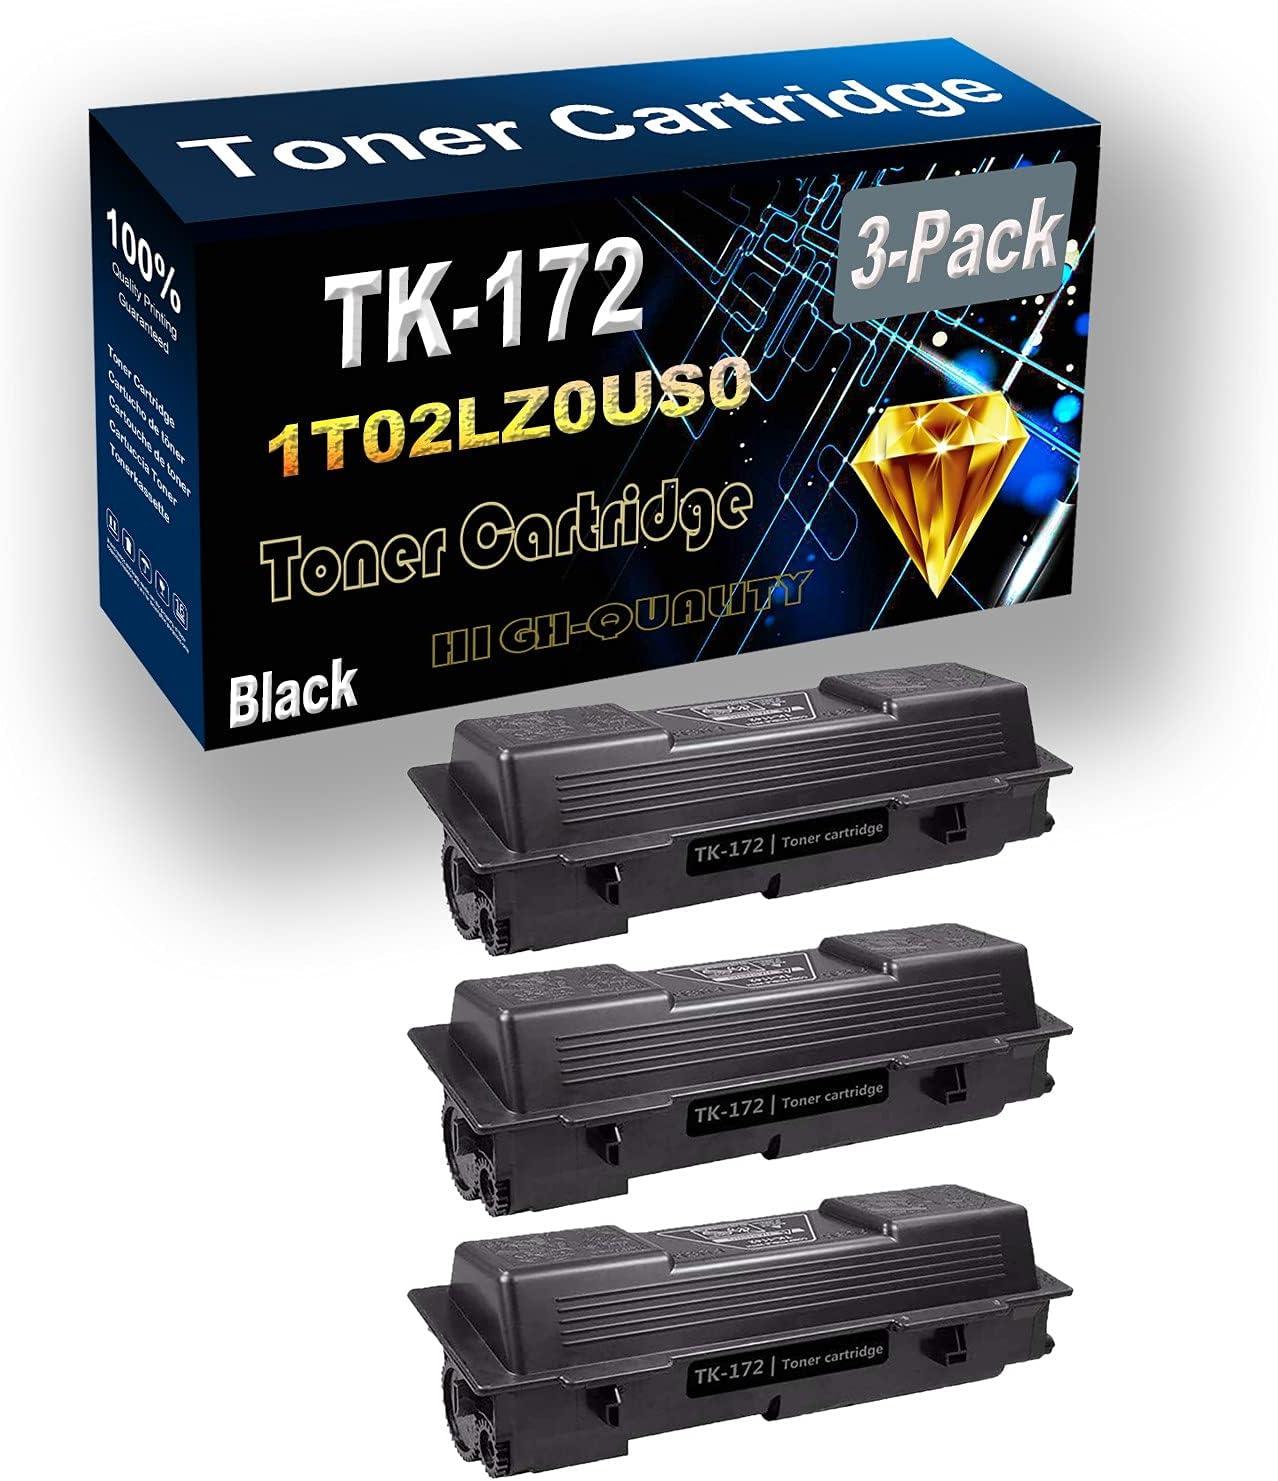 3-Pack (Black) Compatible High Yield TK172 TK-172 | 1T02LZ0US0 Laser Printer Toner Cartridge use for Kyocera FS-1320D FS-1370DN P2135d P2135dn Printer